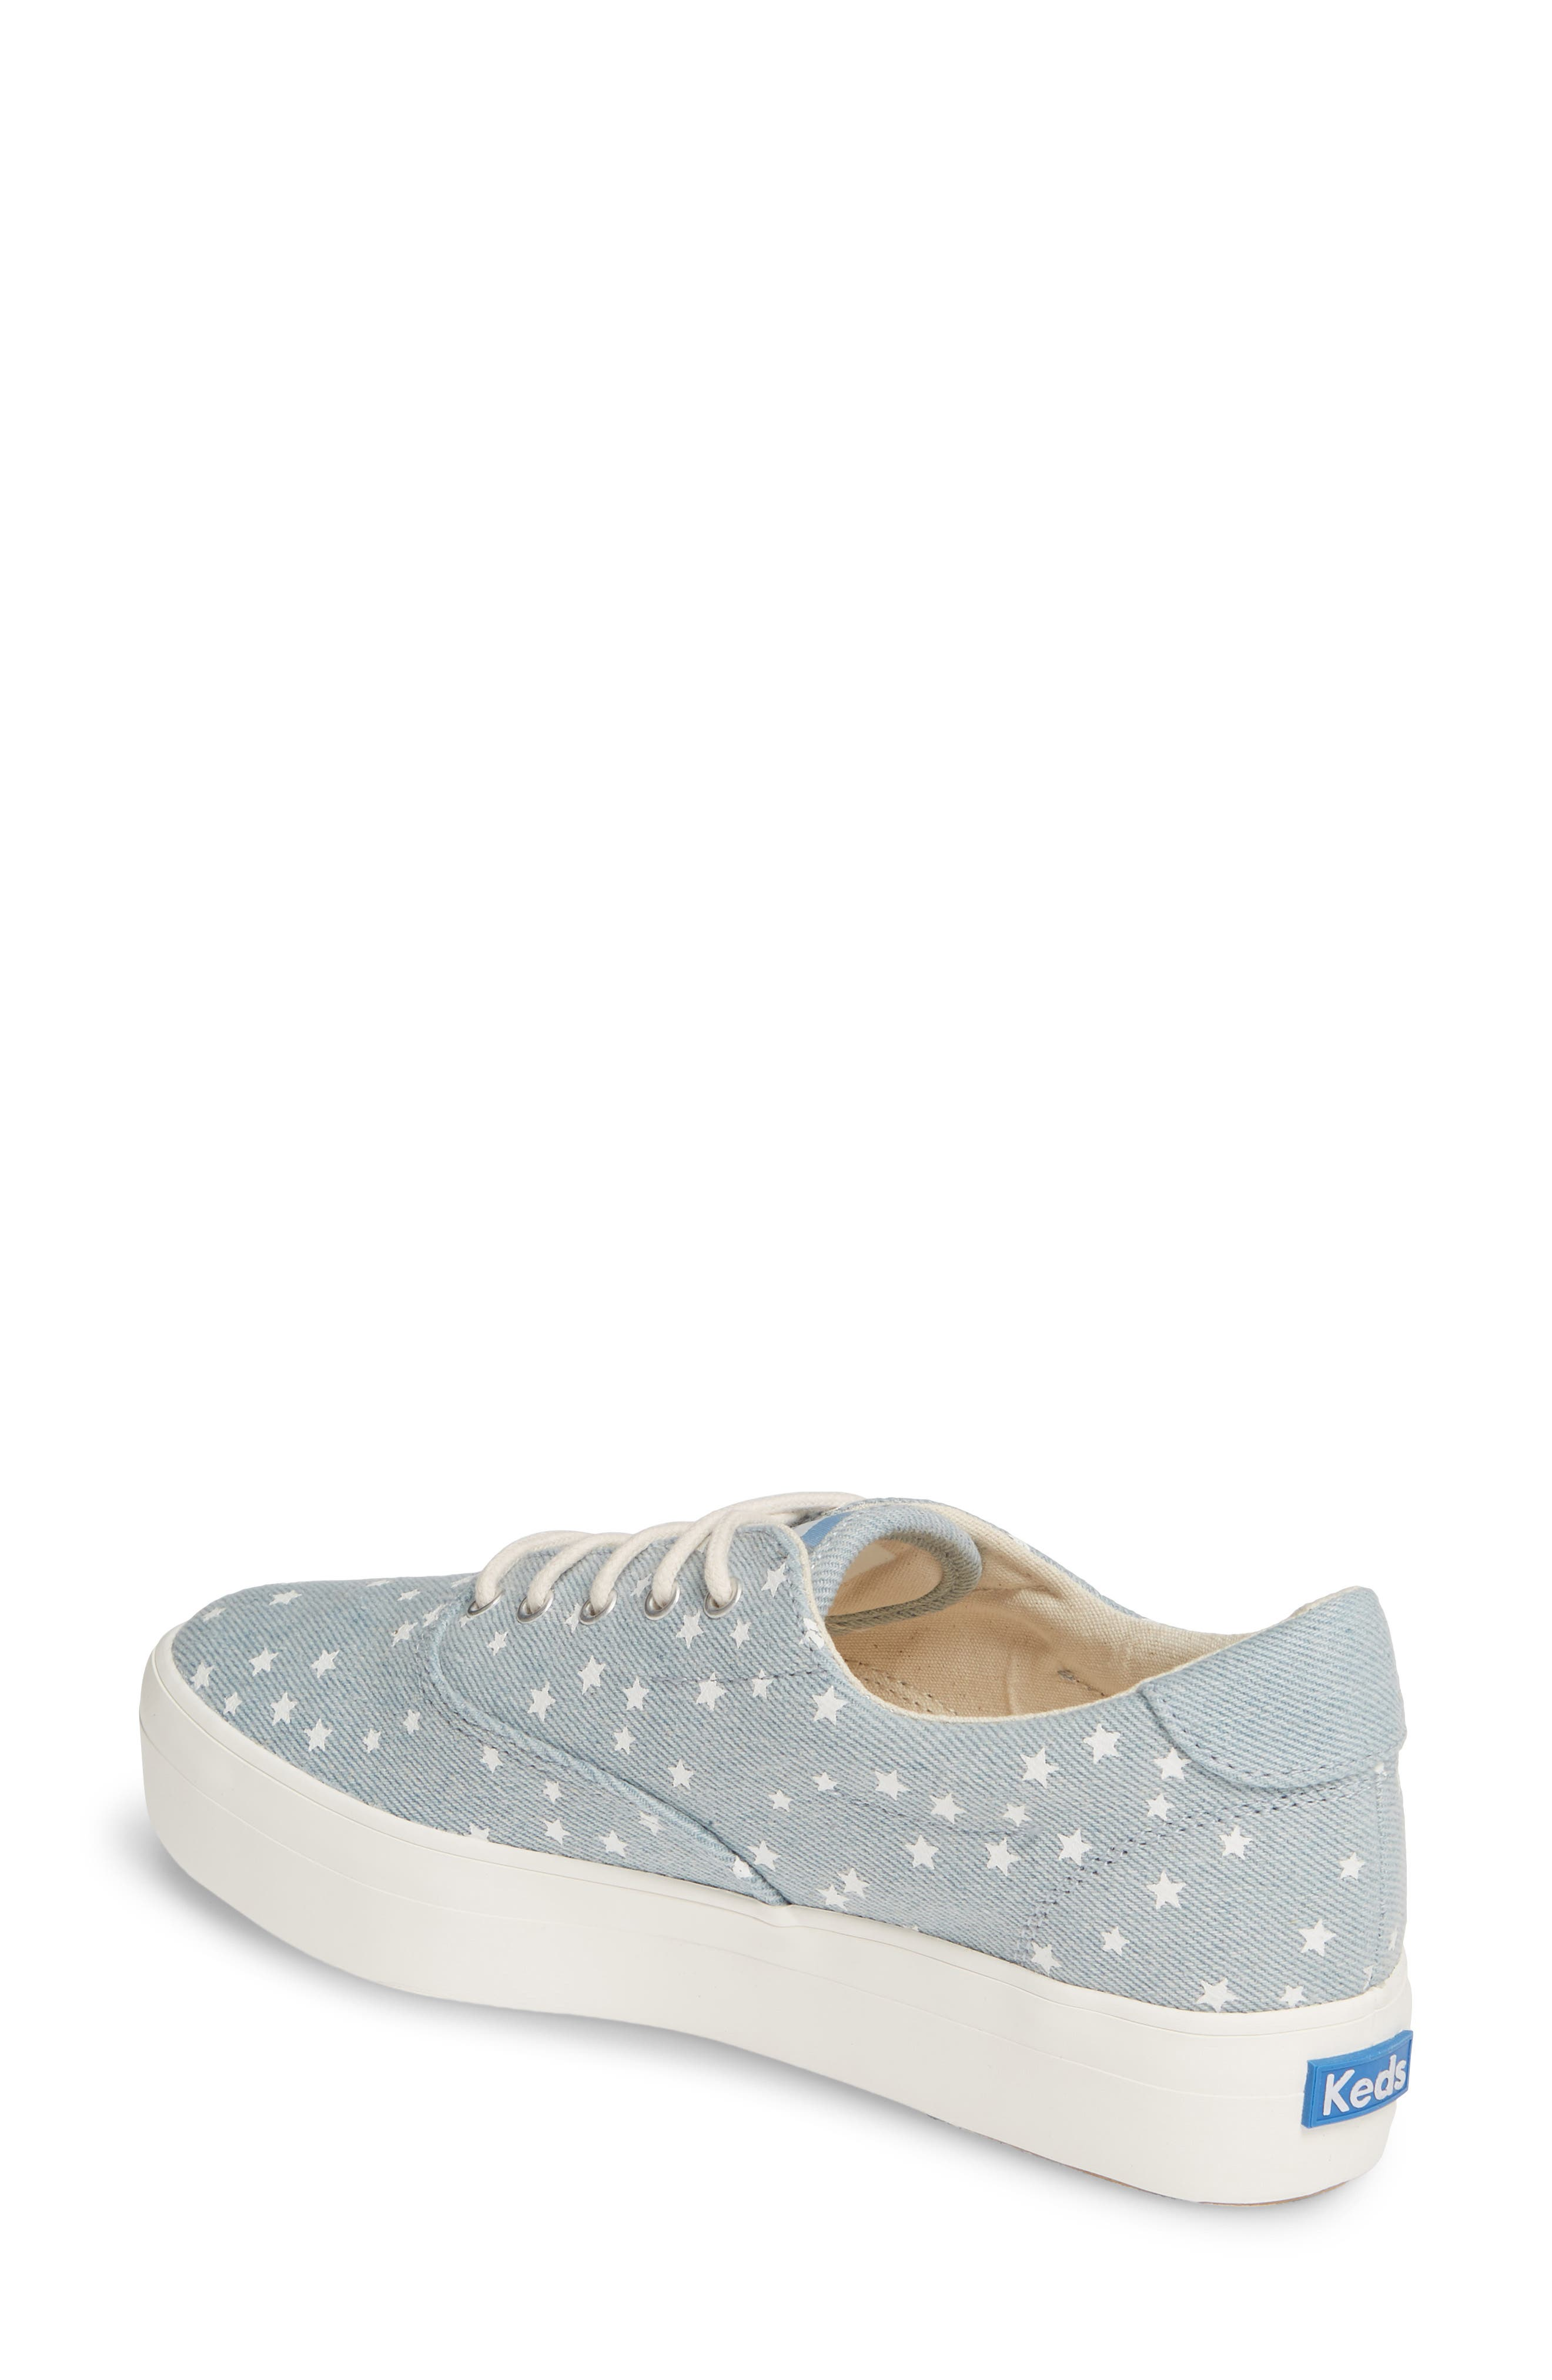 KEDS<SUP>®</SUP>, Rise Denim Star Sneaker, Alternate thumbnail 2, color, LIGHT BLUE